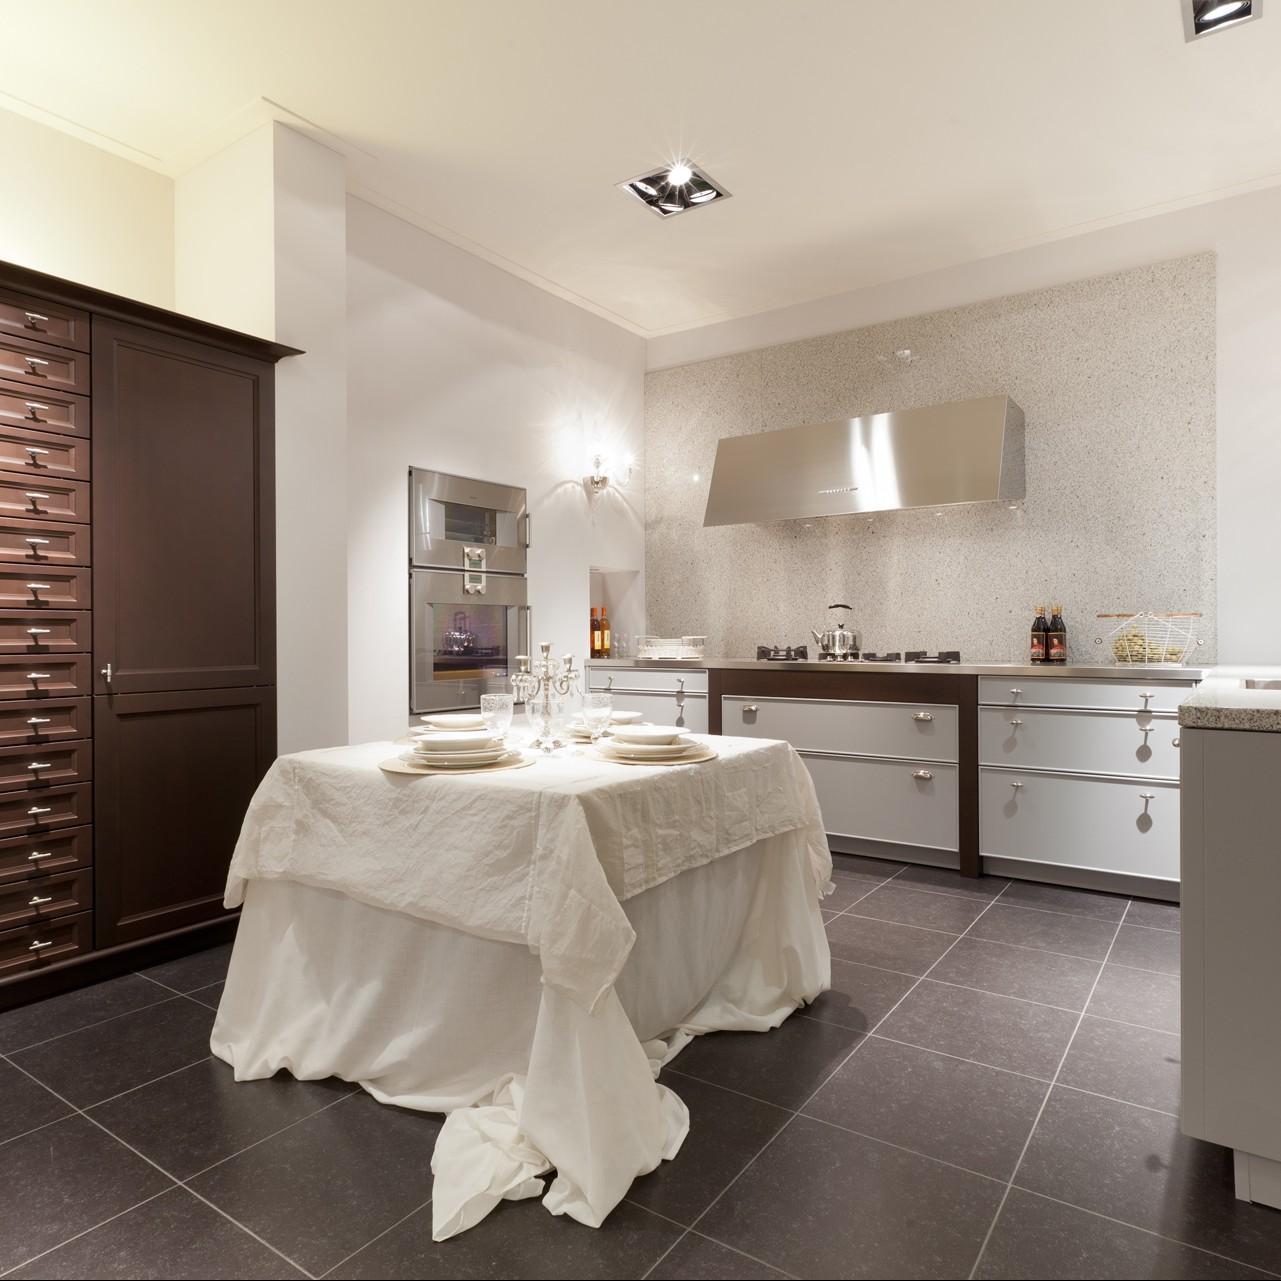 showroomkeuken siematic beauxarts aswa keukens. Black Bedroom Furniture Sets. Home Design Ideas